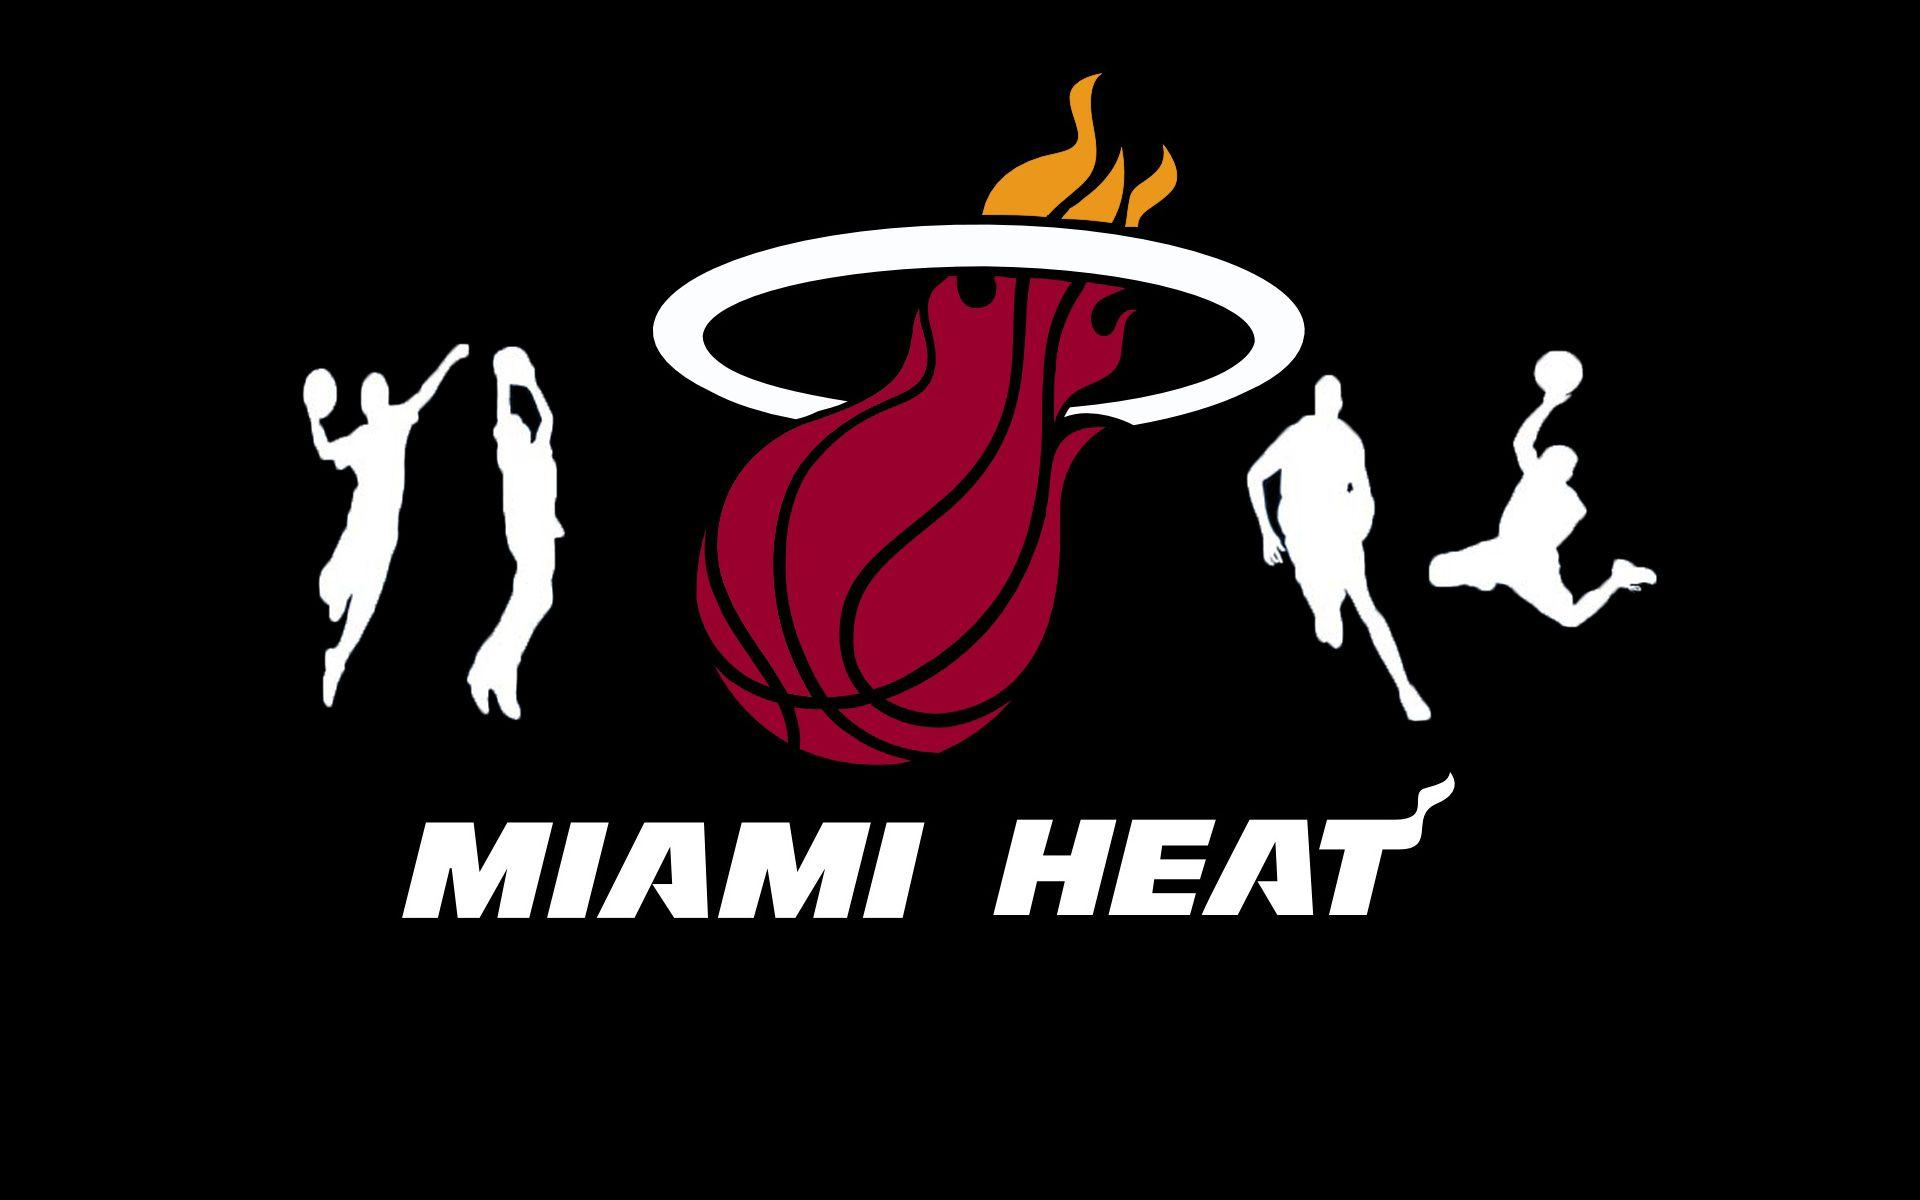 Miami Heat Logo Wallpapers - Wallpaper Cave